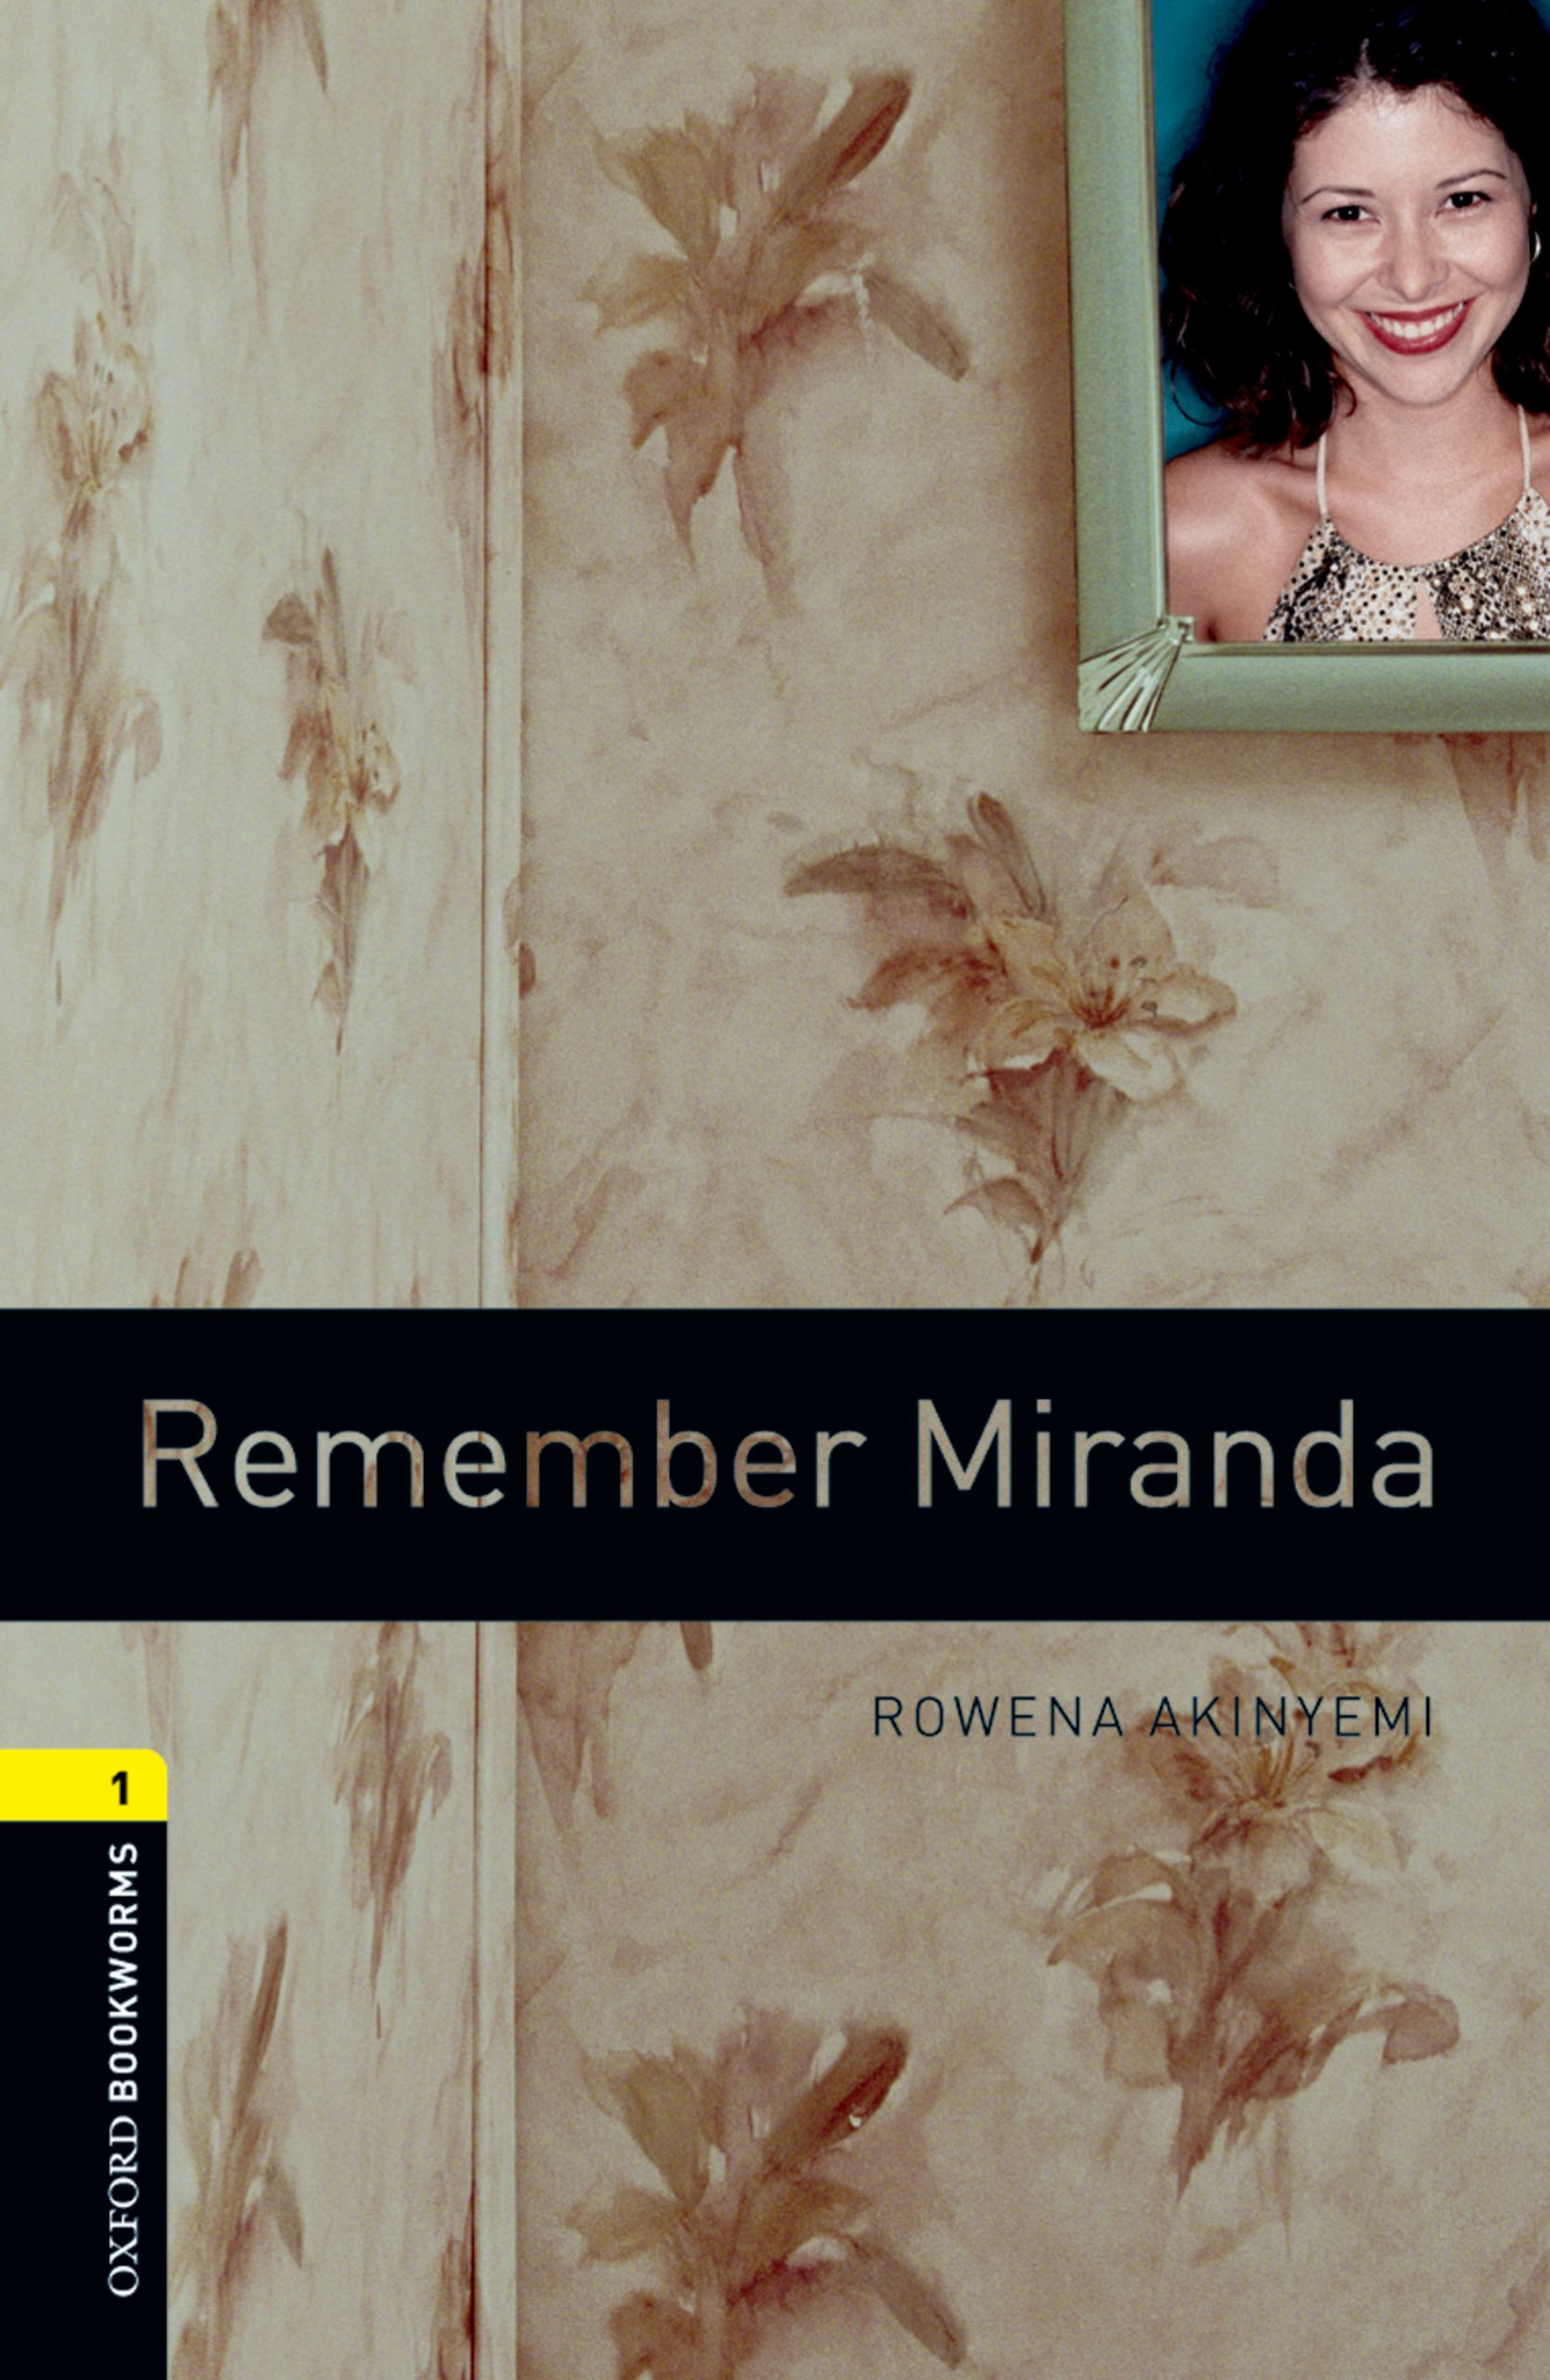 купить Rowena Akinyemi Remember Miranda